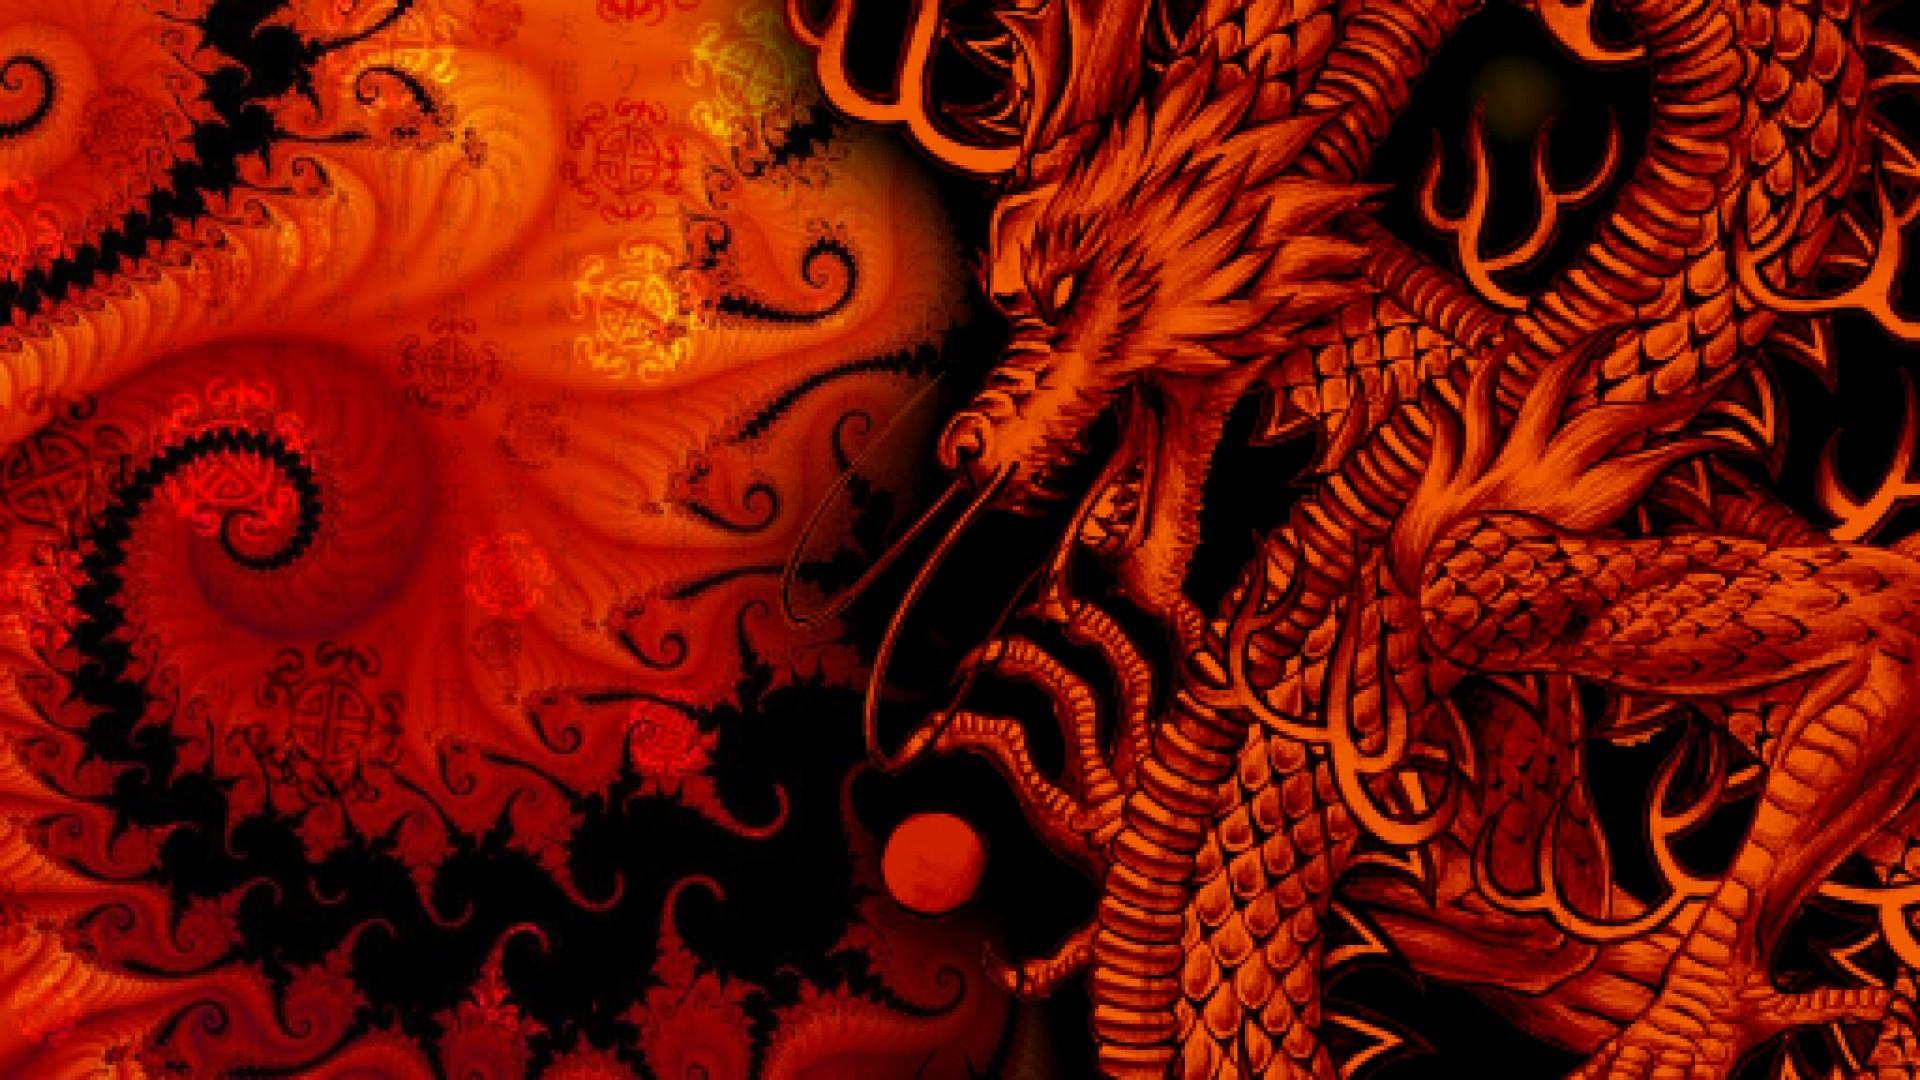 118 Red Dragon Wallpaper Hd